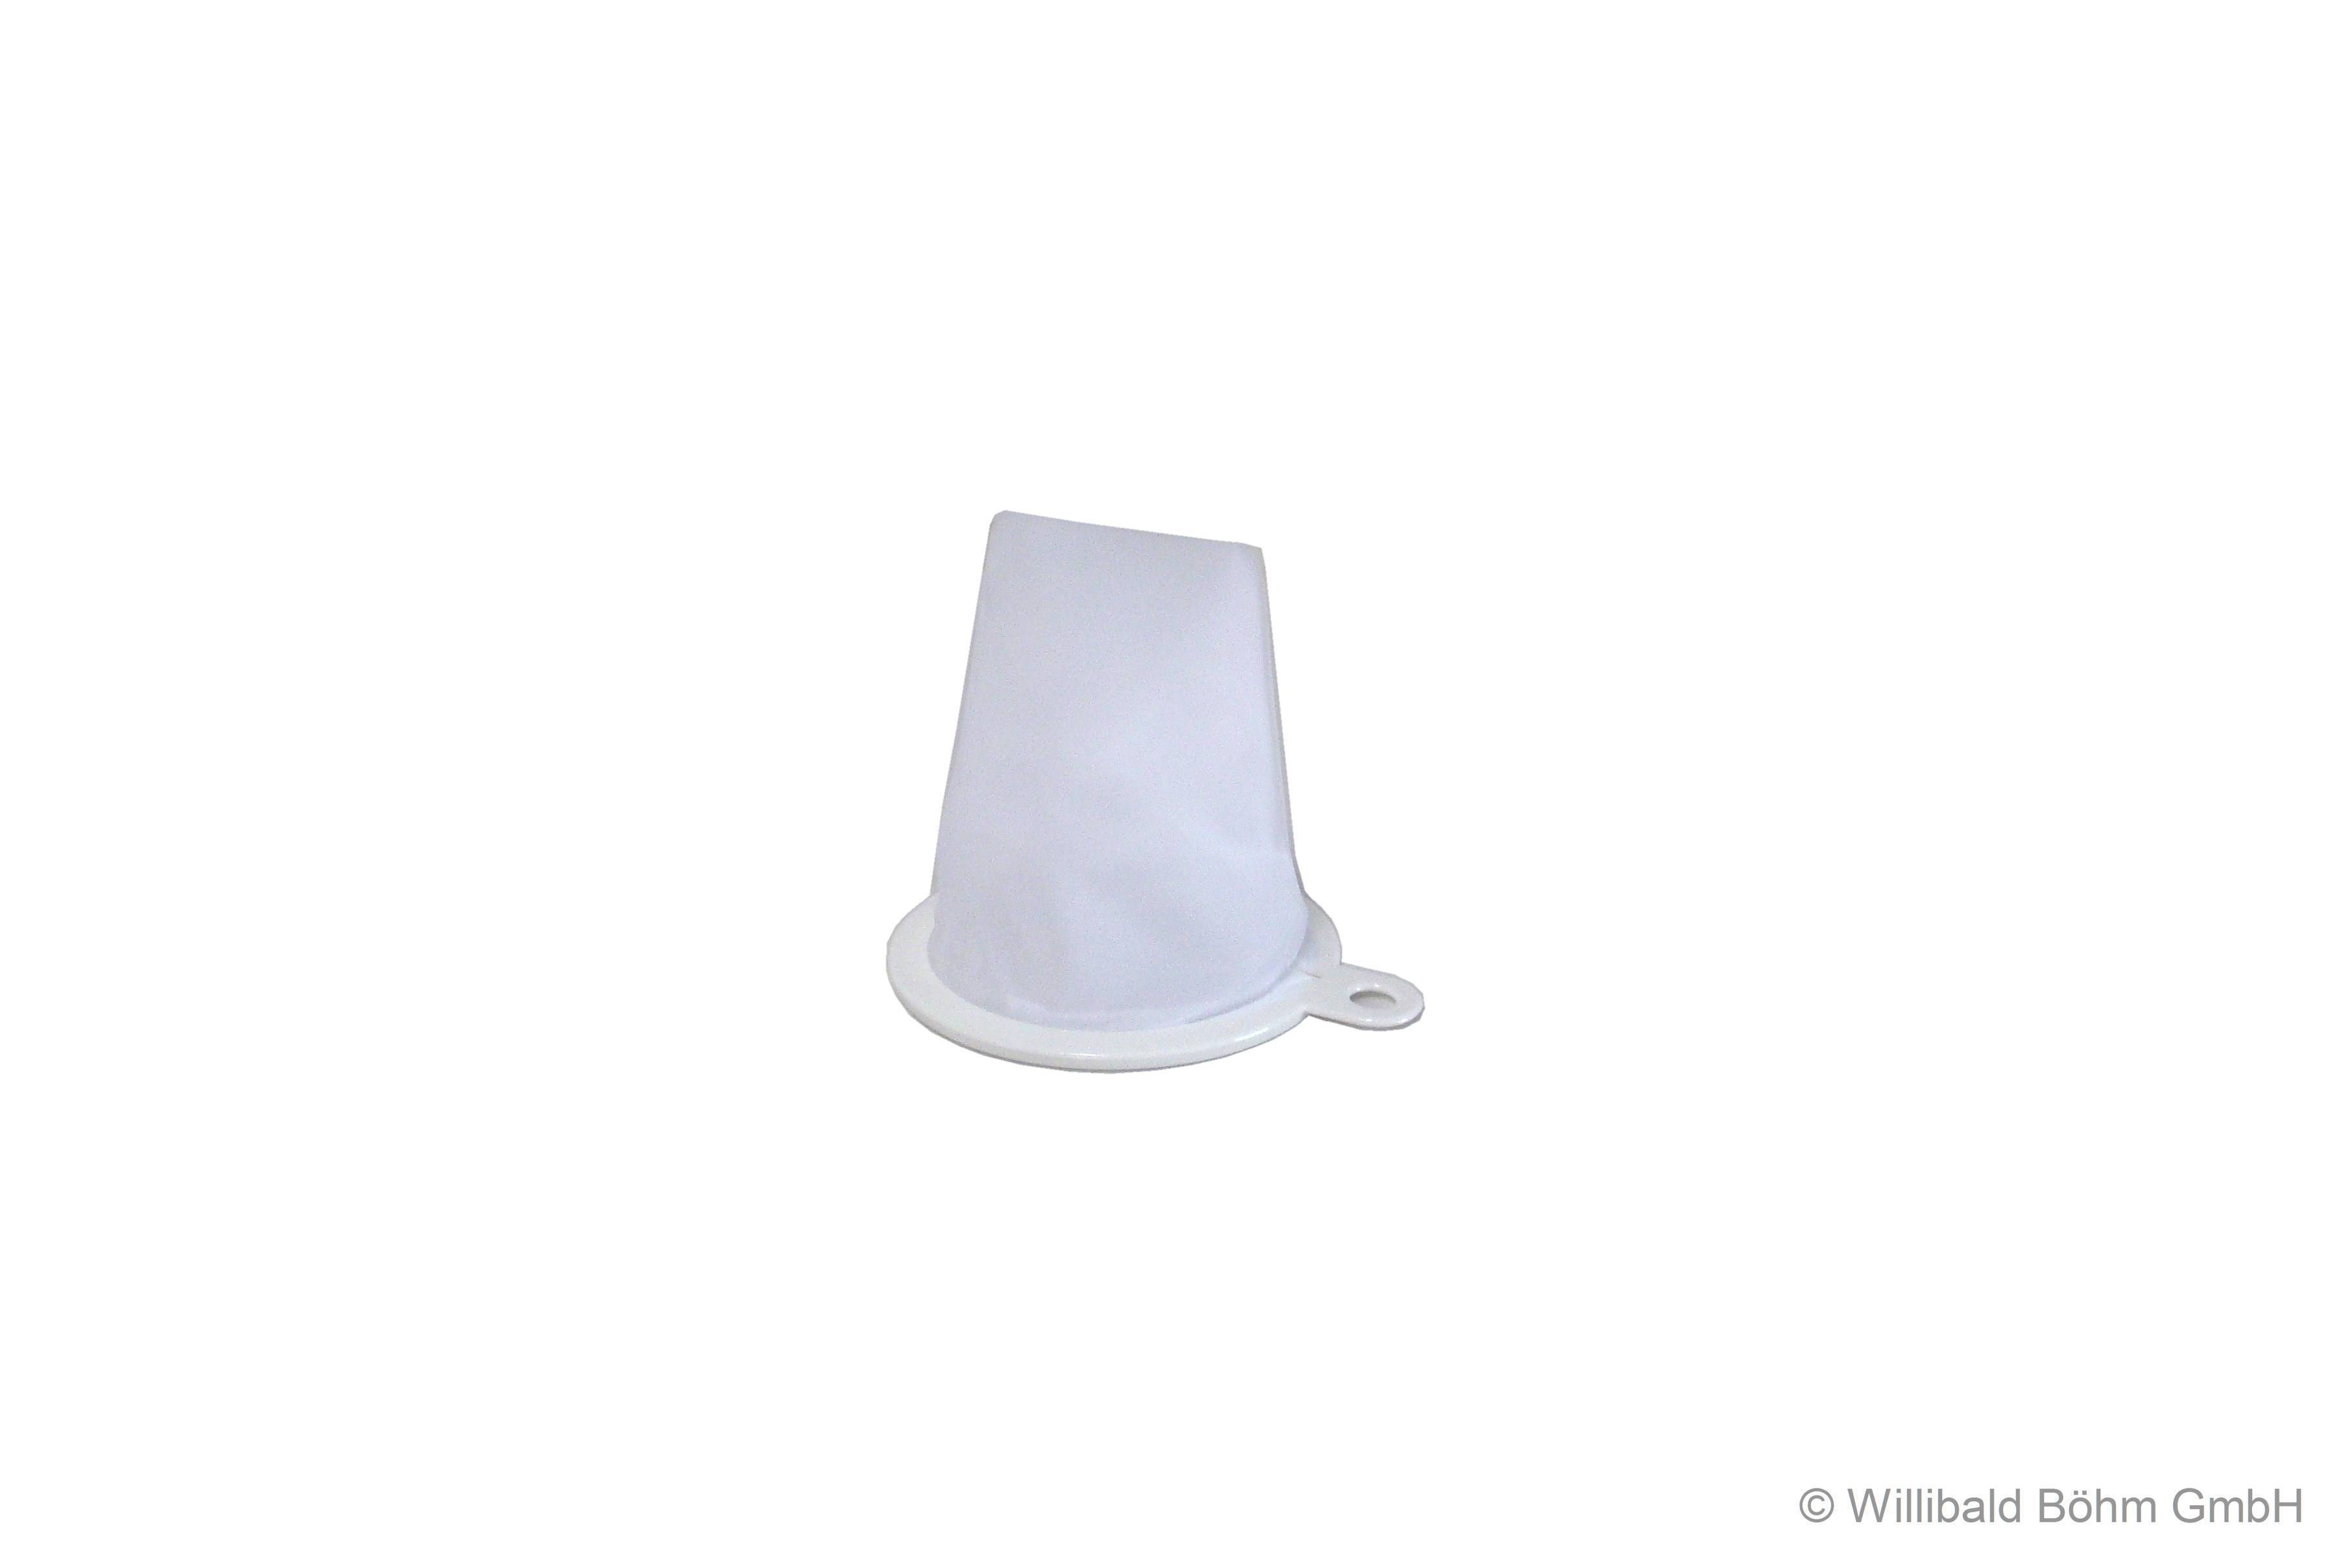 Filterbeutel für Teezubereitung lang Sonja PLASTIC Teefilter wiederverwendbar